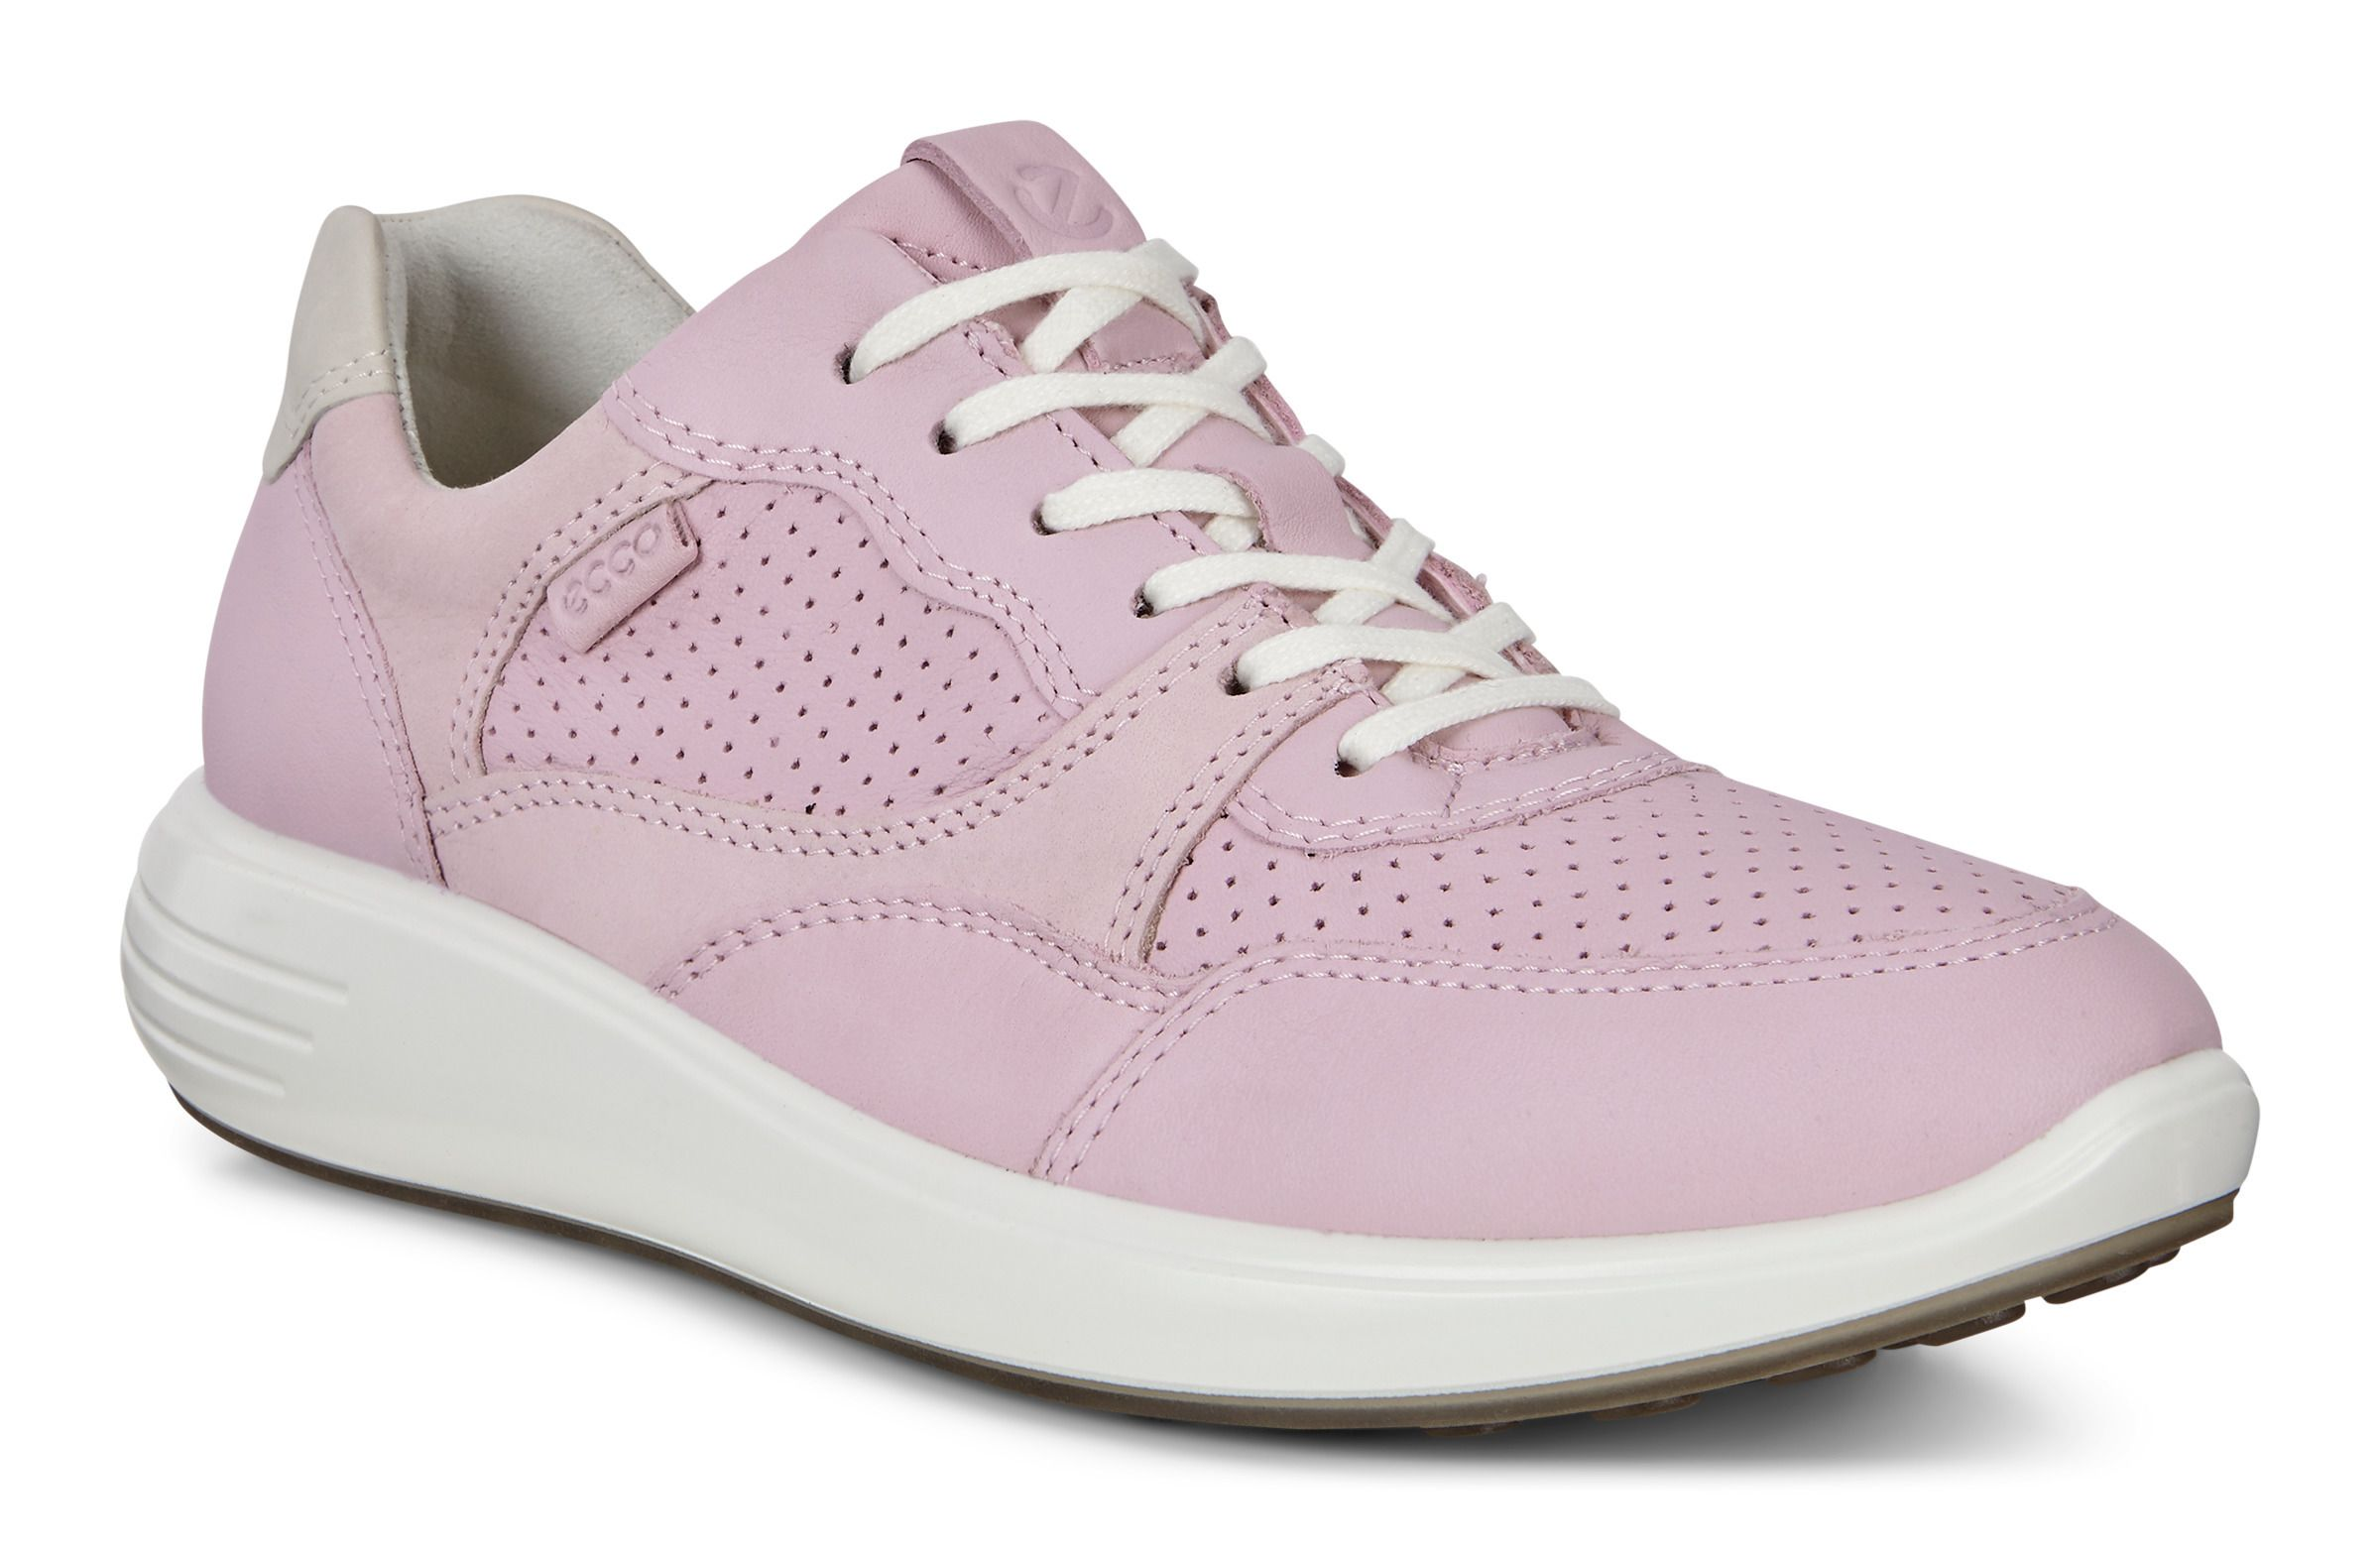 Buy Ecco ECCO Womens Shoes Online | Simple Yet So Beautiful